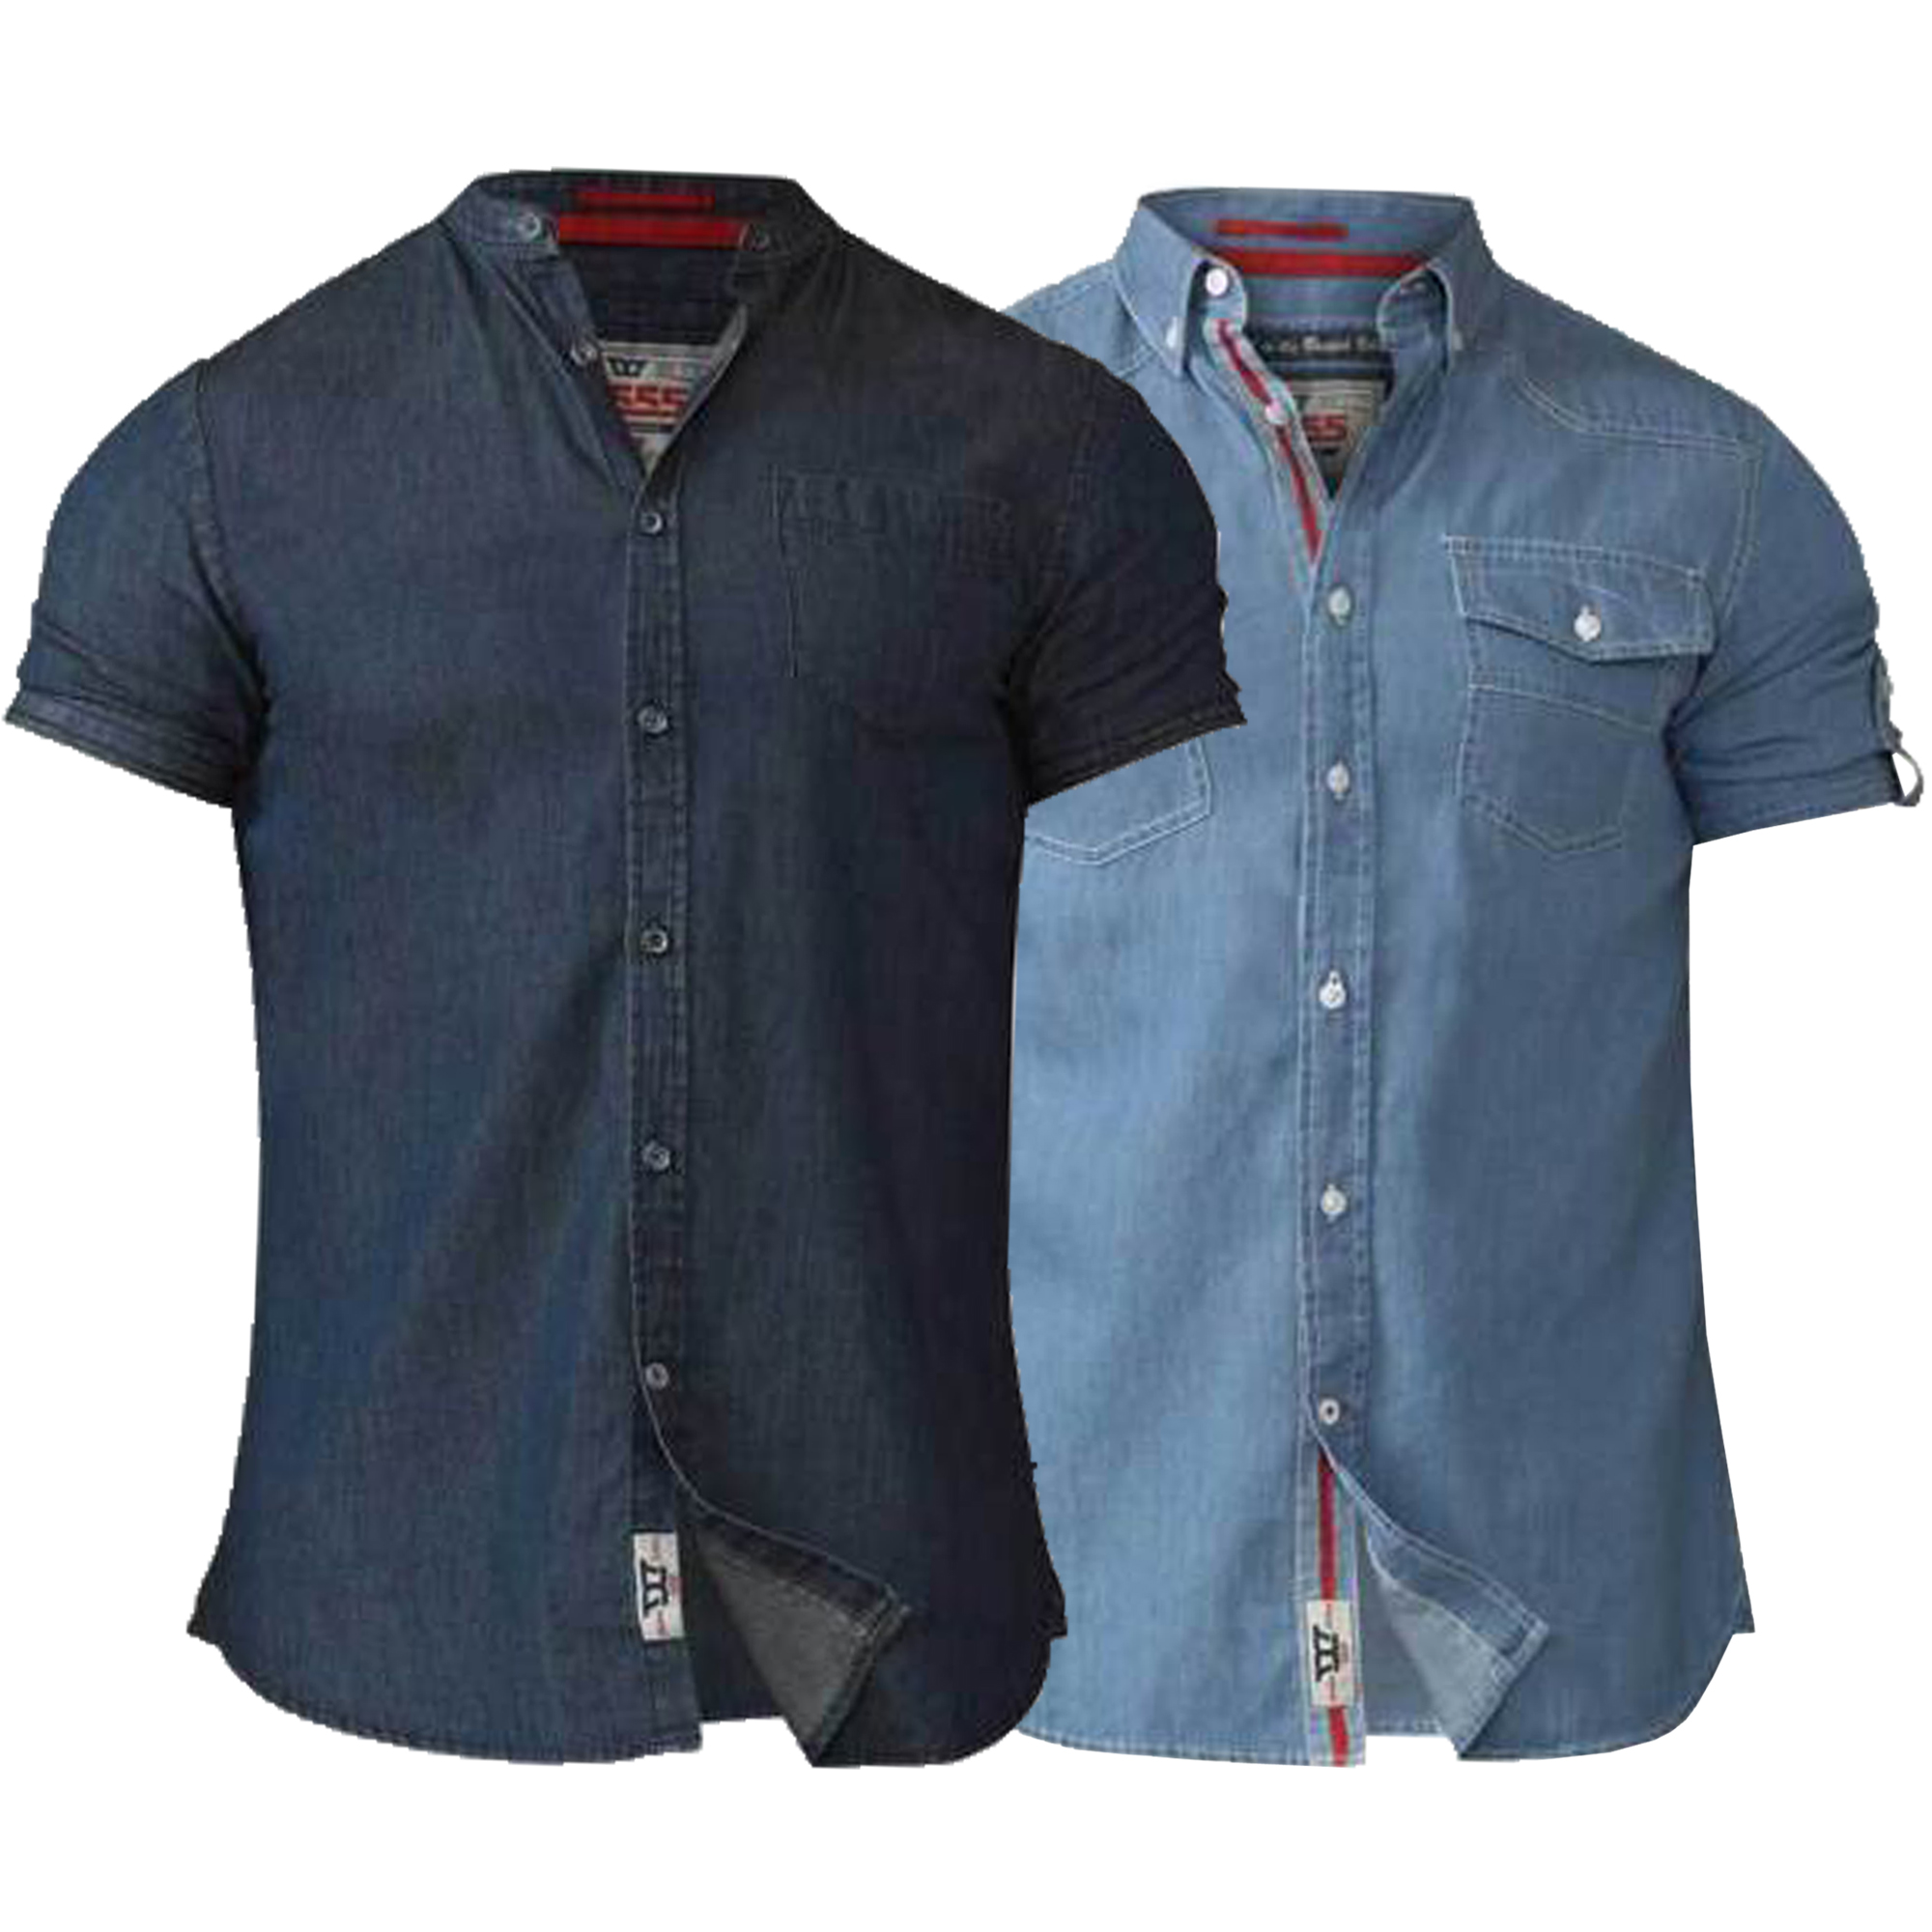 Mens-Denim-Shirt-D555-Duke-Big-King-Size-Cotton-Astra-Nathan-Short-Sleeved-New thumbnail 4